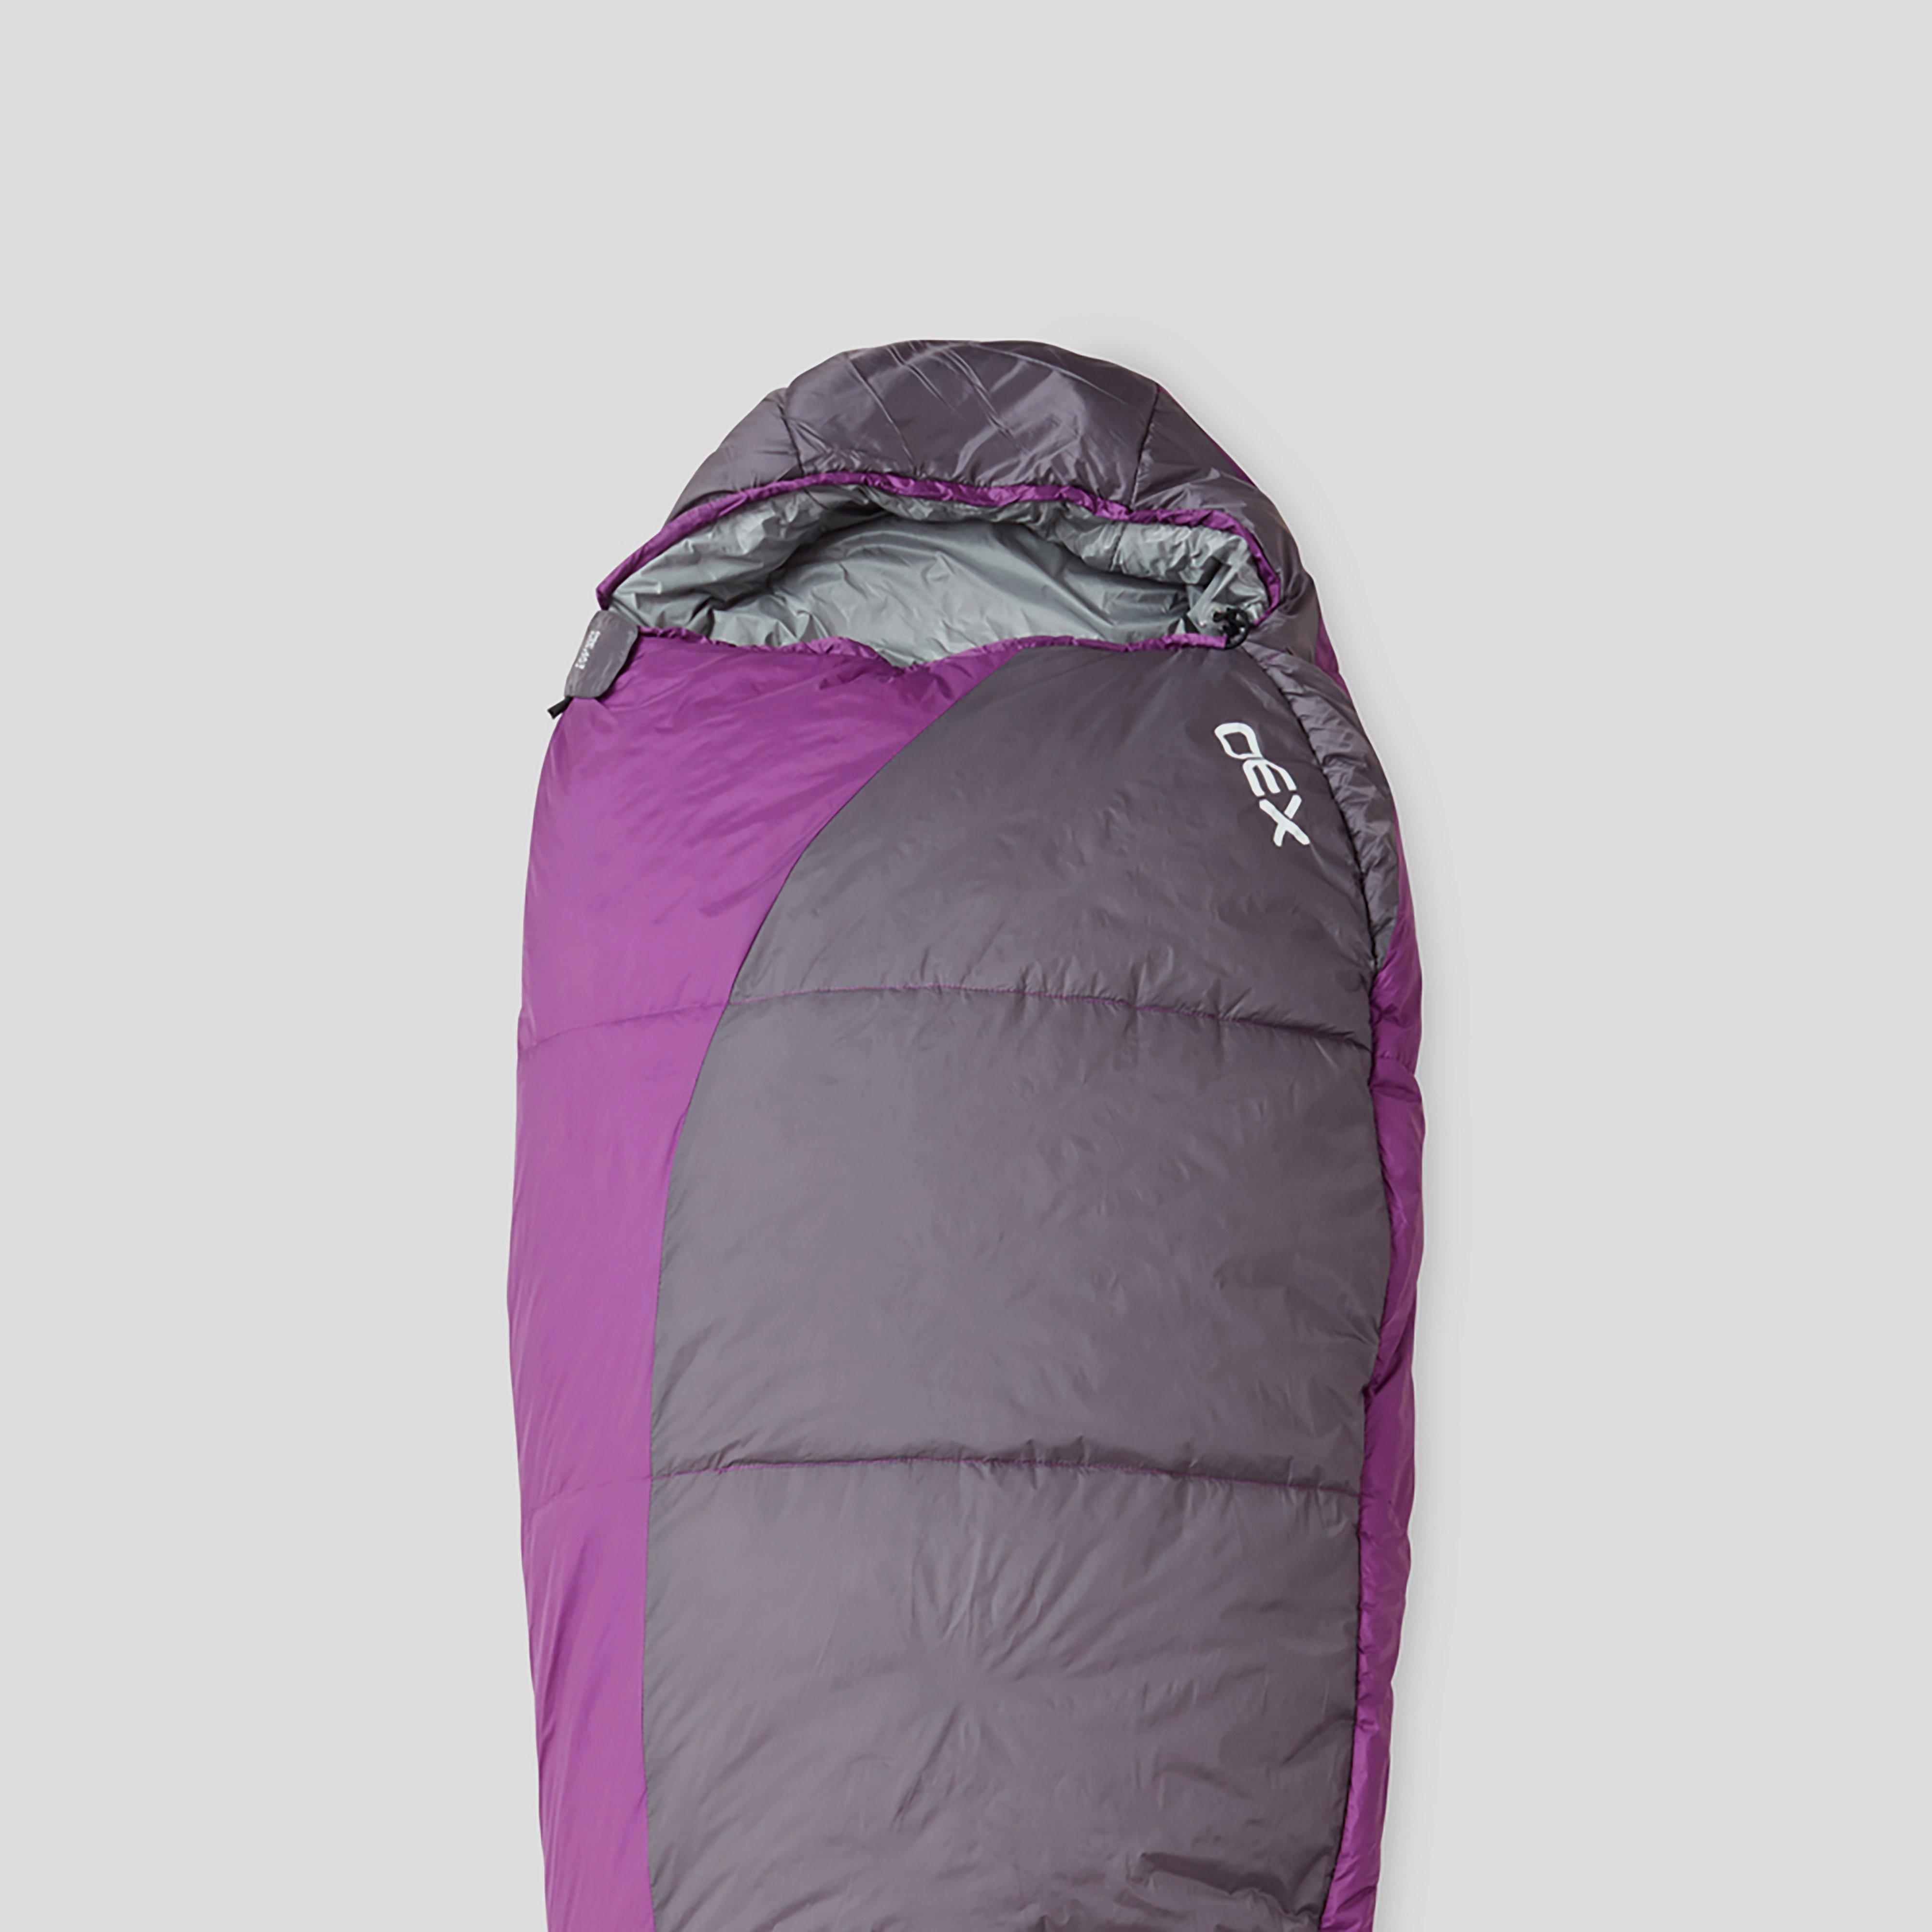 OEX Fathom Evolution 350 Sleeping Bag